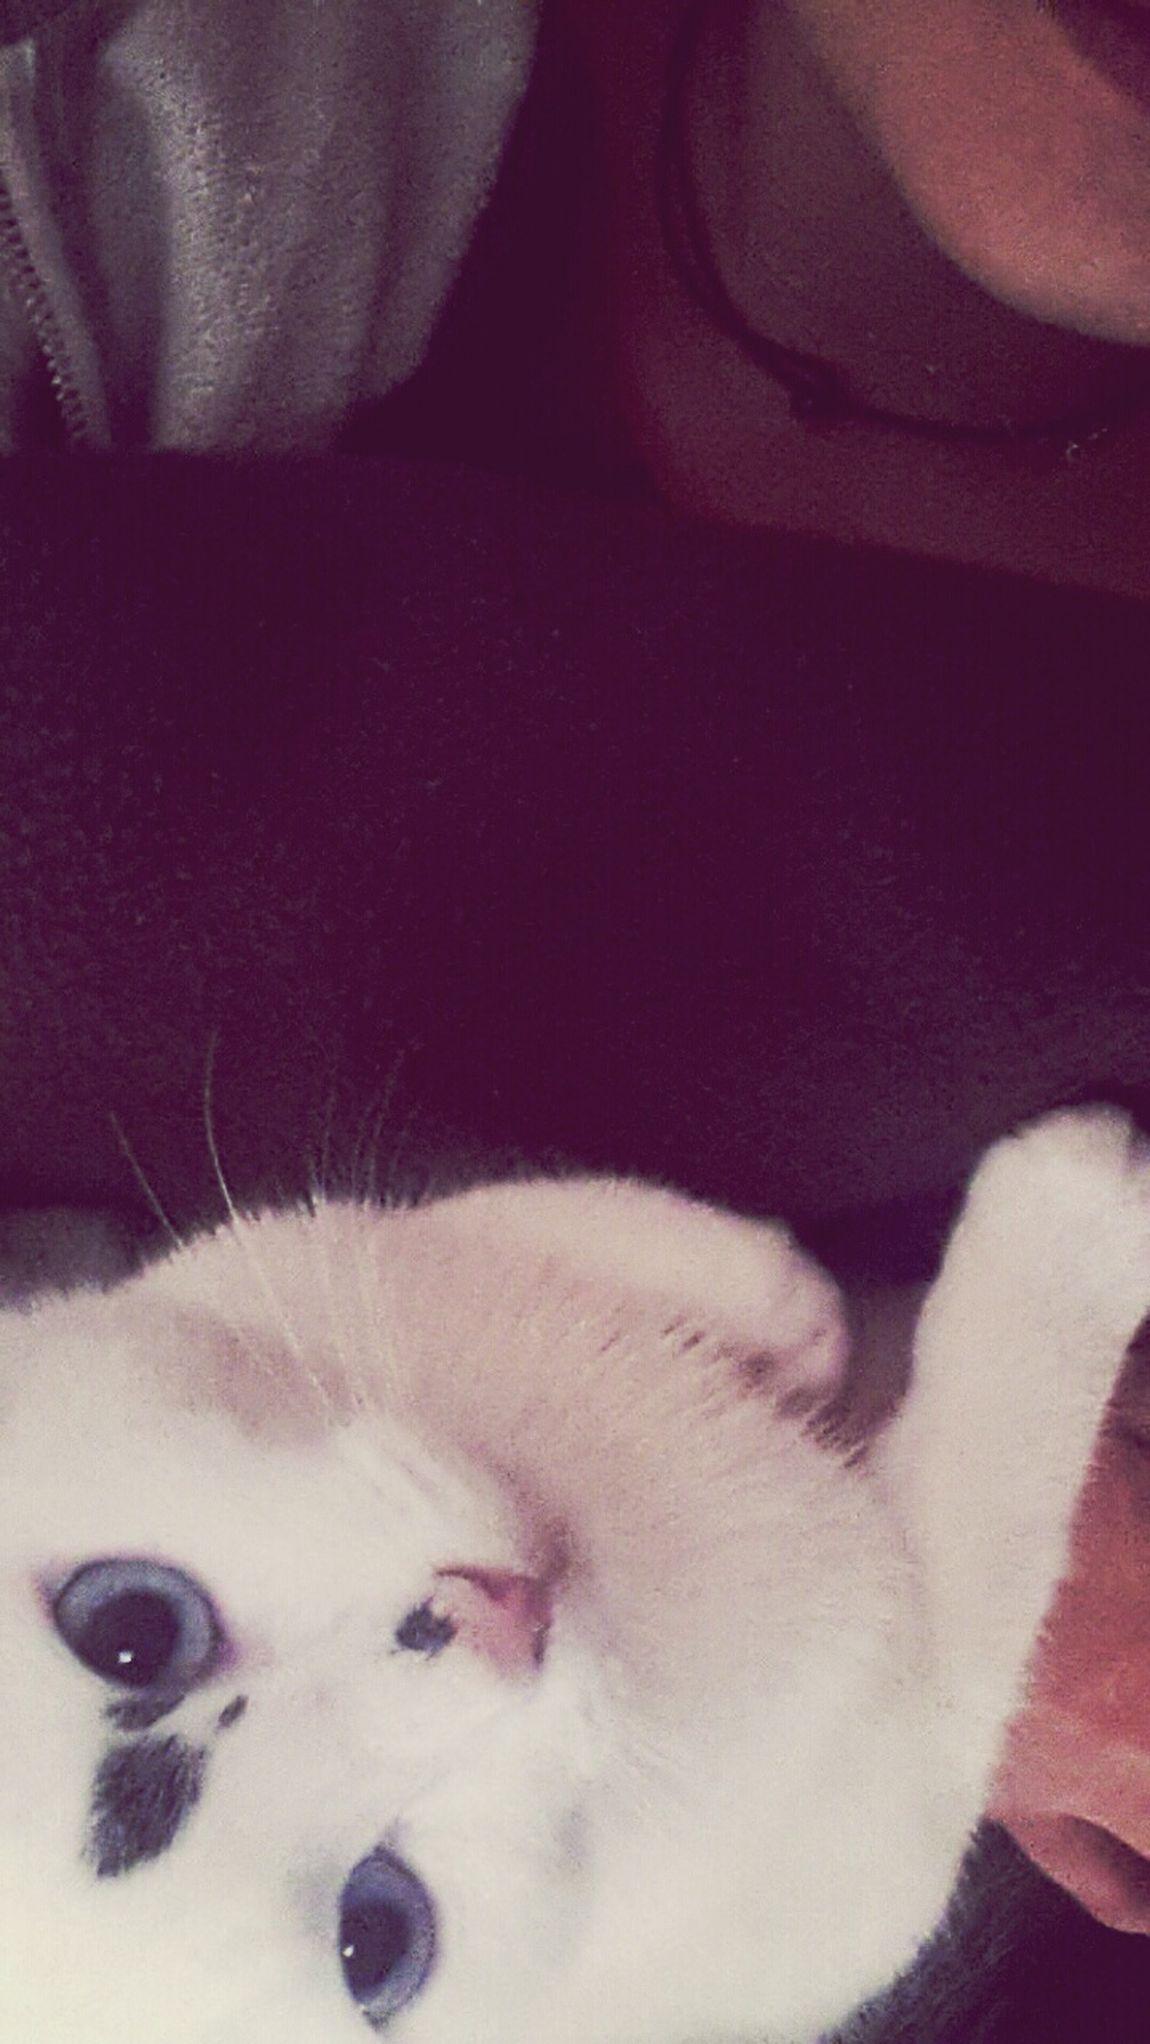 Mon chat es plus photogénique que moi . 😒 Catstar #cat #catnap #catoftheday #catpic #catlovers #catsconnect #catinstagram #catsofinstagram #gato #gatinhos #gatto #garfield #petstagram #premierpet #photooftheday #petsofinstagram #picoftheday #petlovers #instabicho #ilovecats #ilovemypet #issovici Lyon7 Calypso Adorable Cat  Love ❤